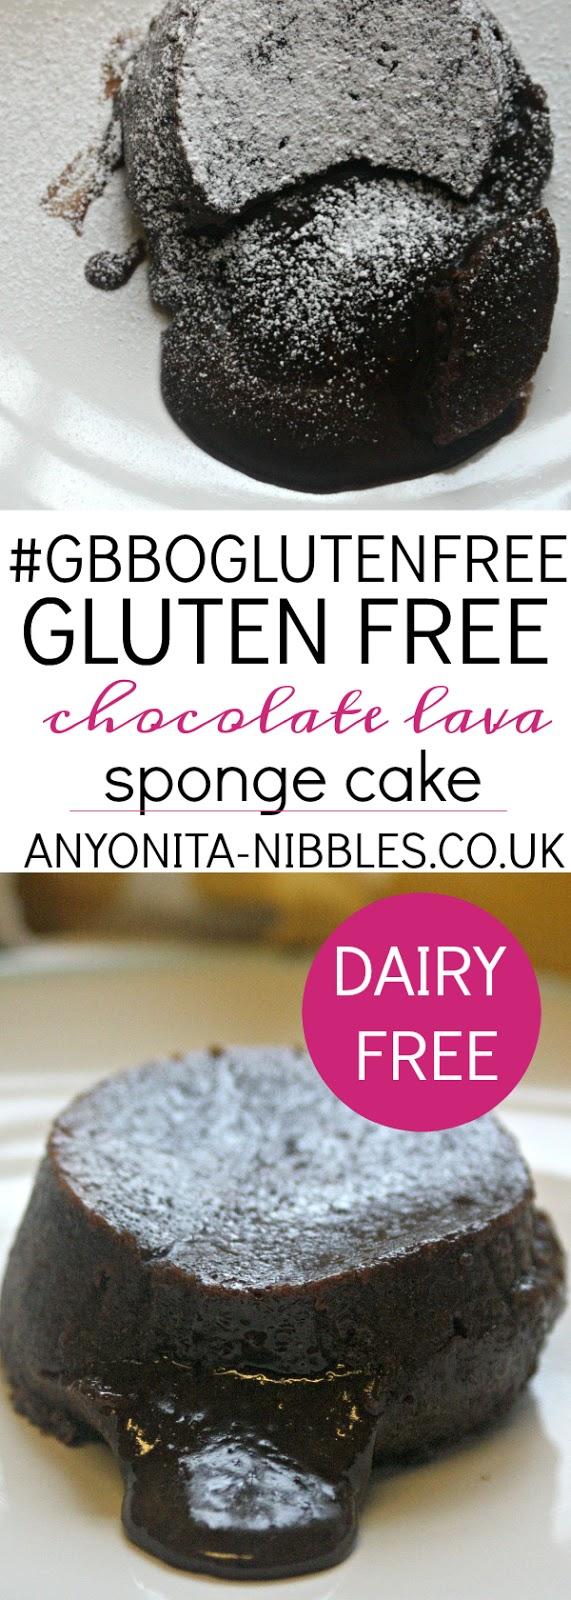 #GBBOGlutenFree Gluten Free Chocolate Lava Sponge Cake | Anyonita Nibbles